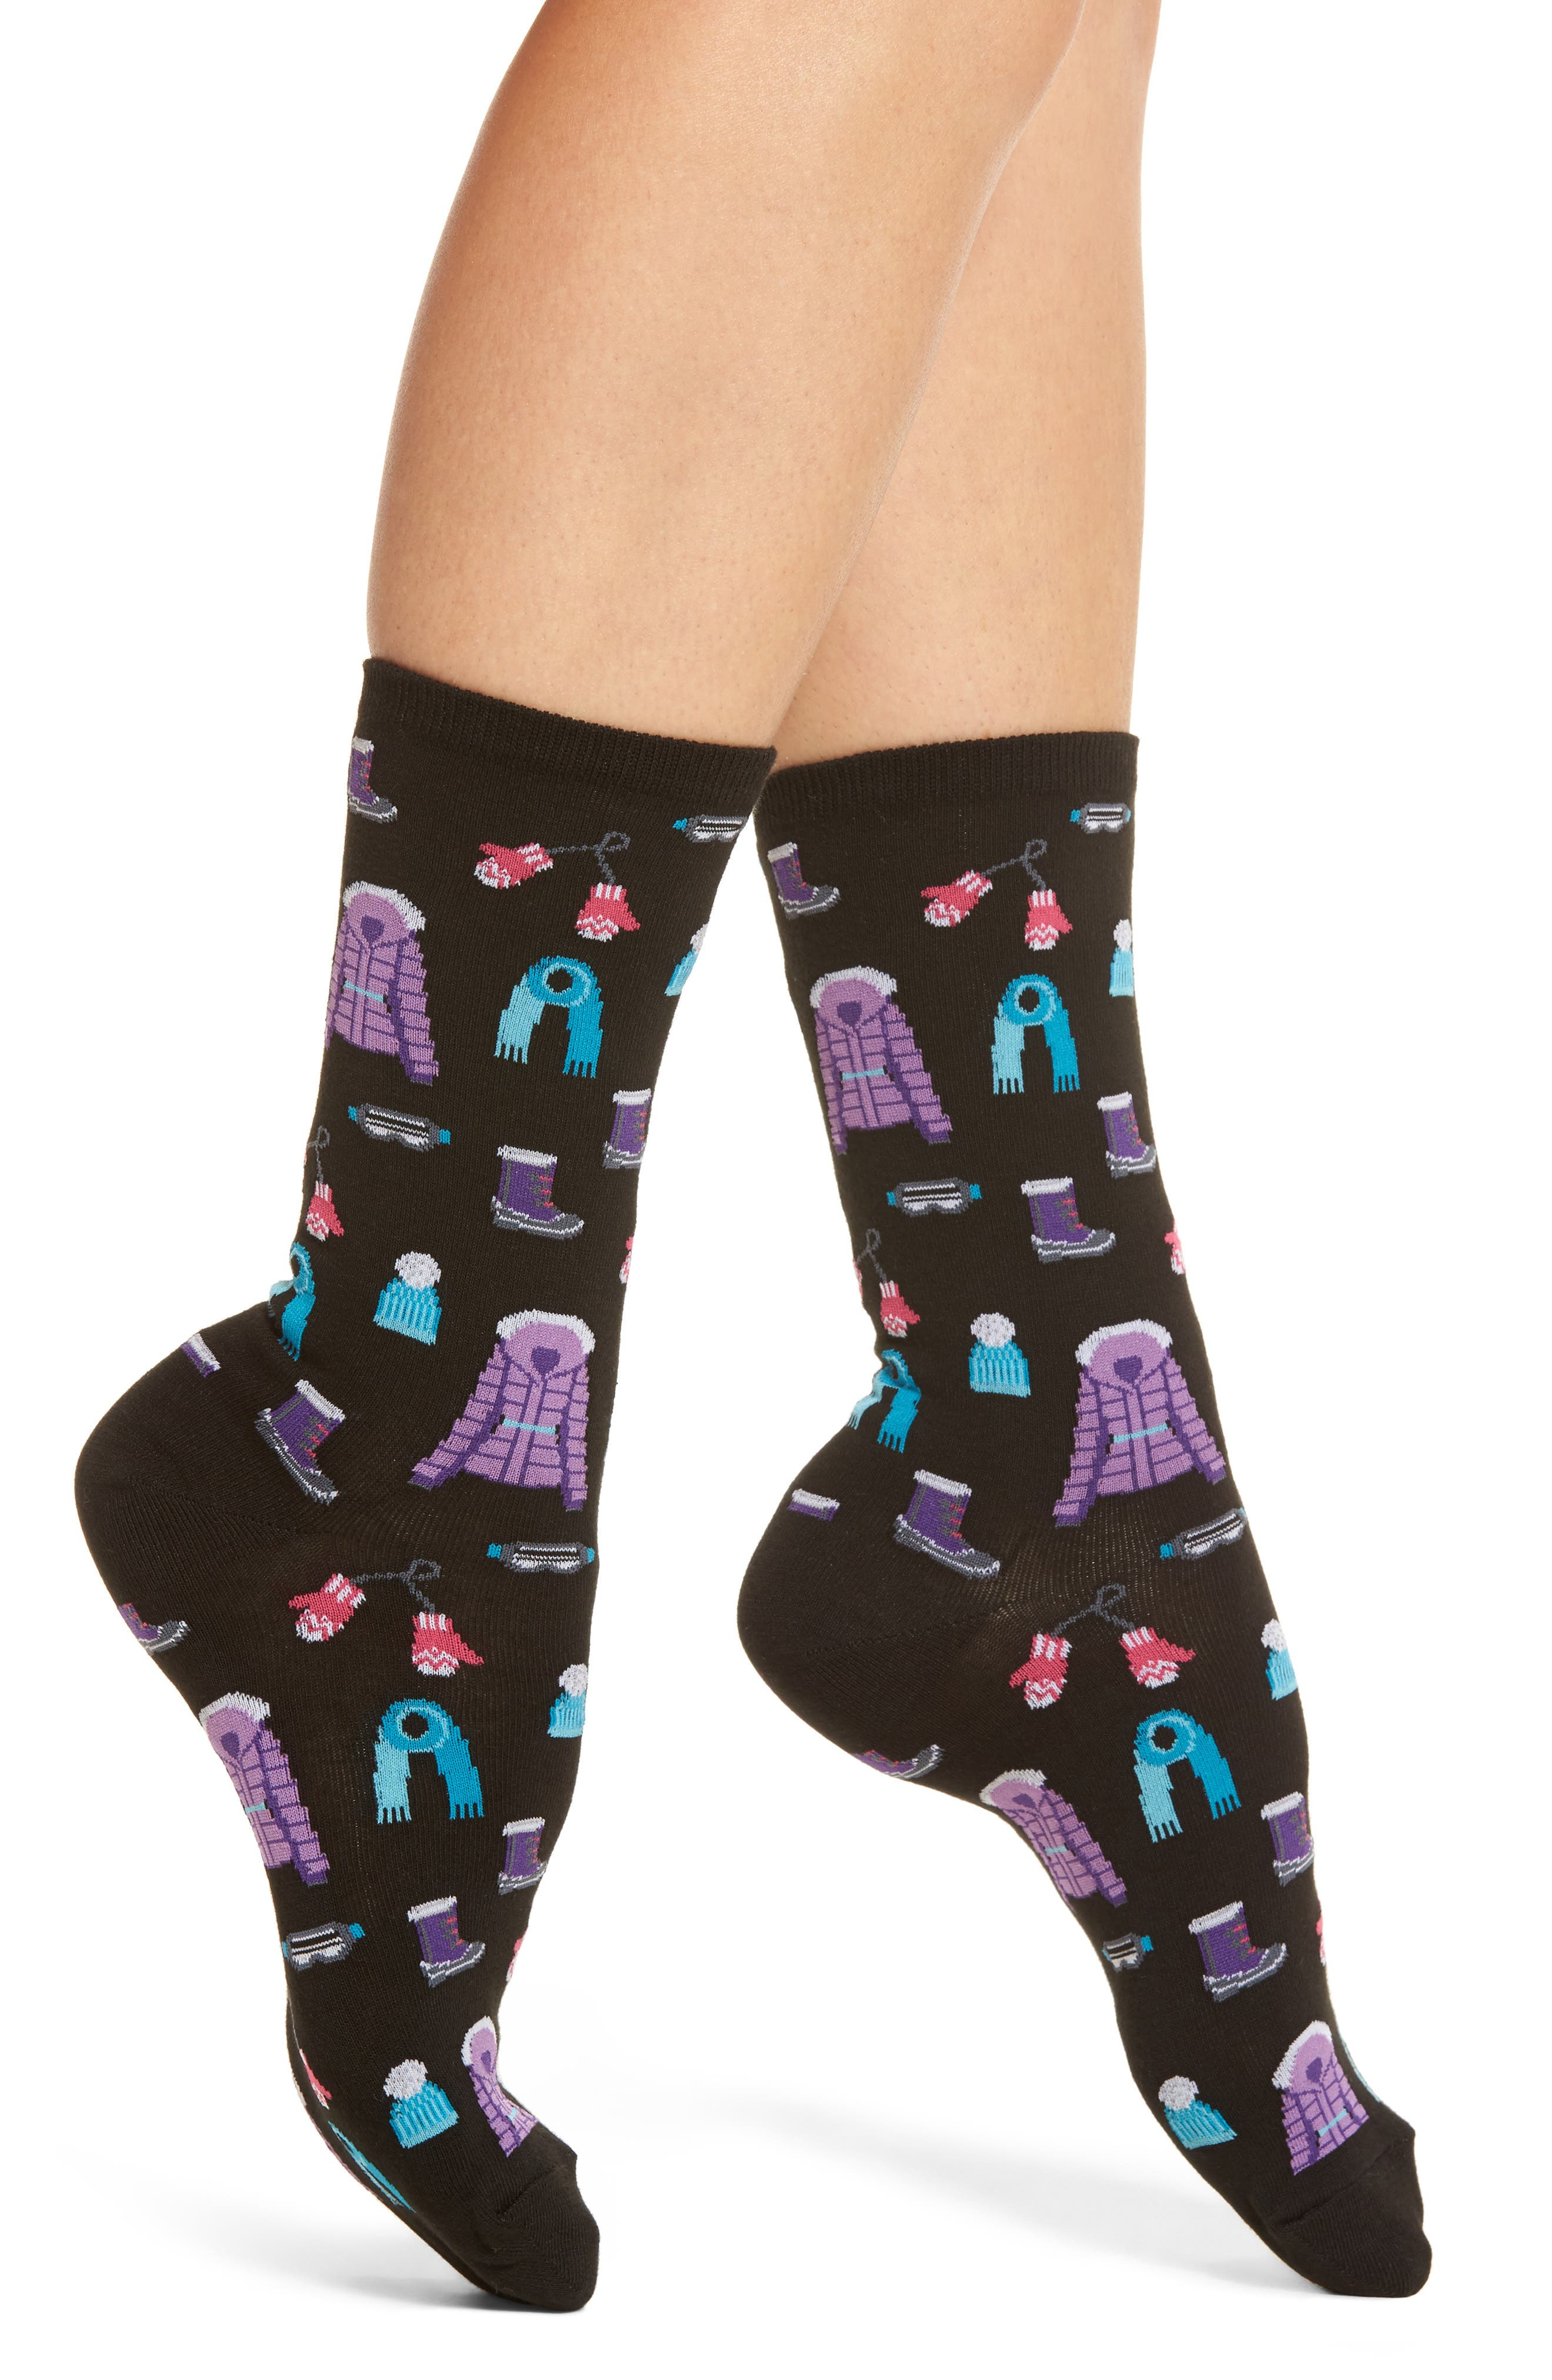 Main Image - Hot Sox Ski Clothes Crew Socks (3 for $15)